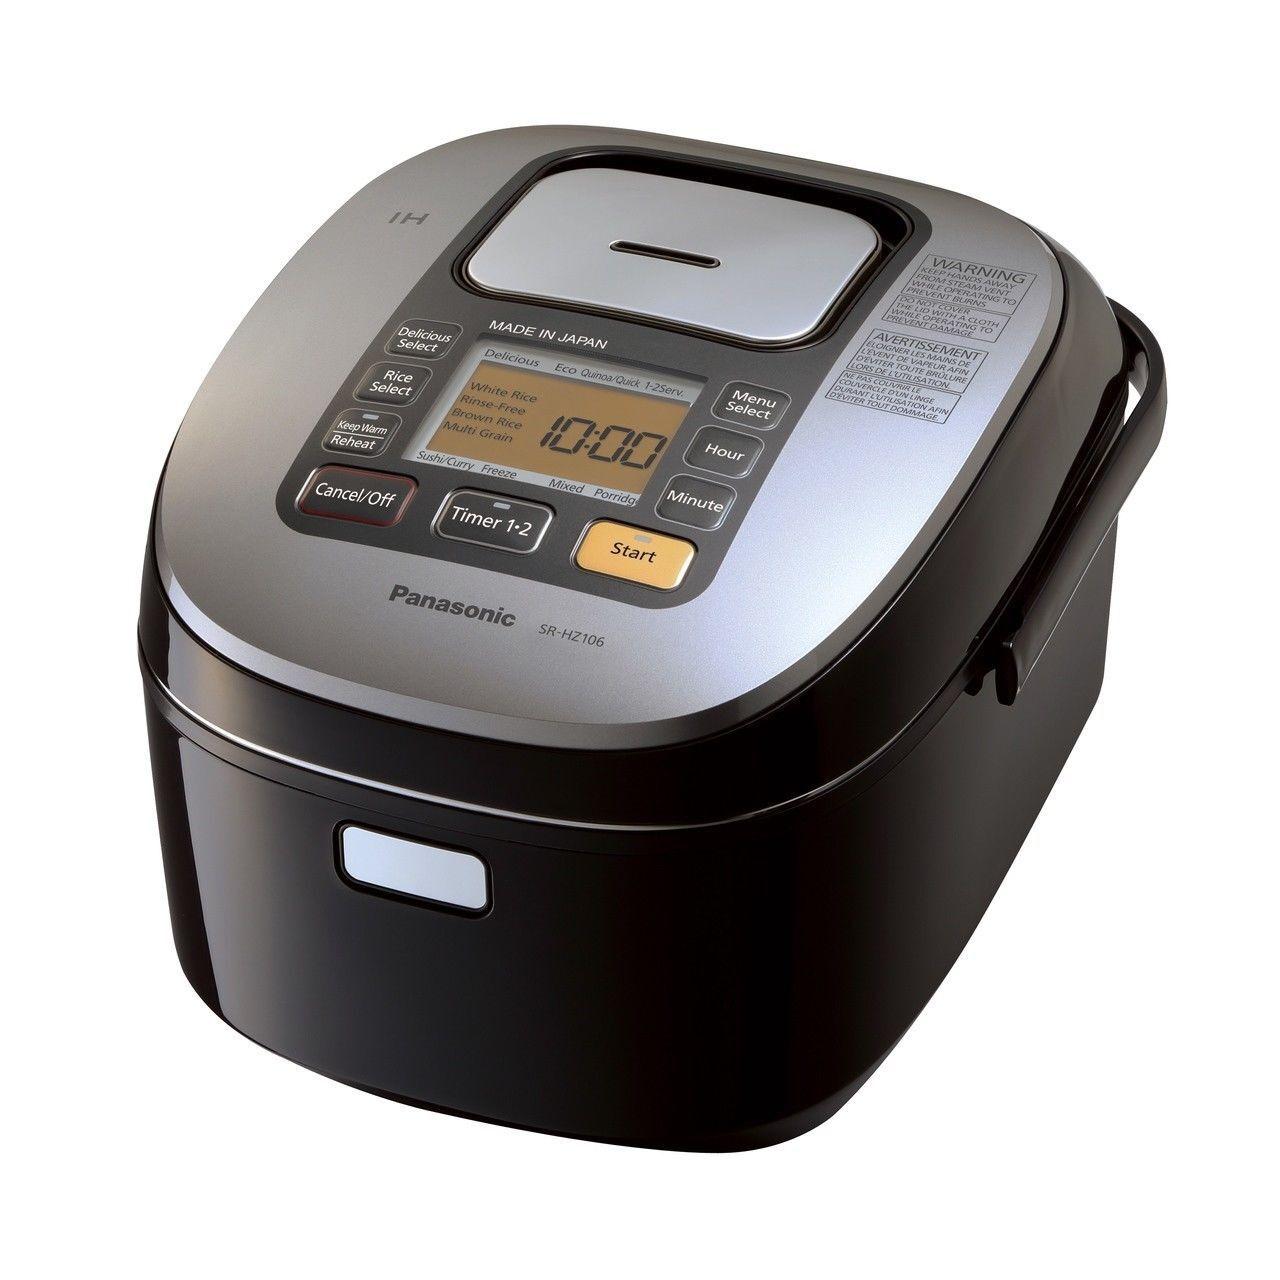 Panasonic Rice Cooker |SRHZ106K| 5.5-cup, multi-function wit